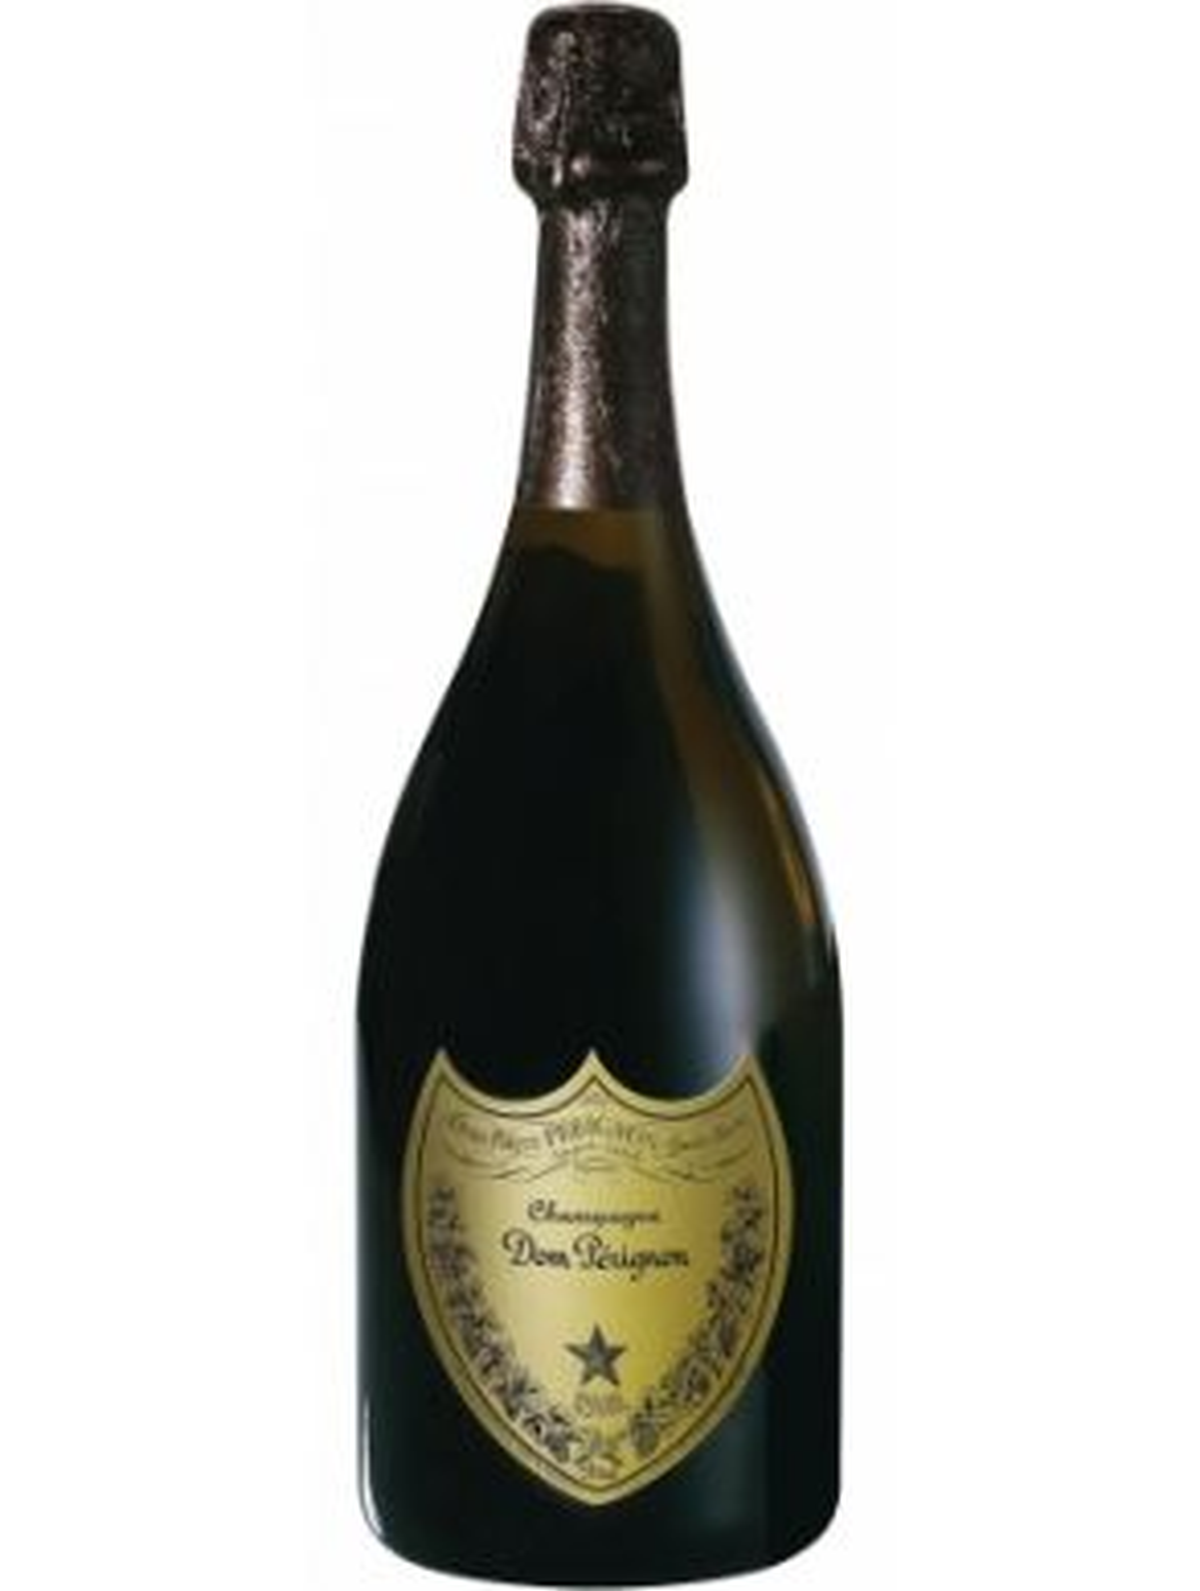 Dom Perignon 1999 Vintage Champagne 75cl